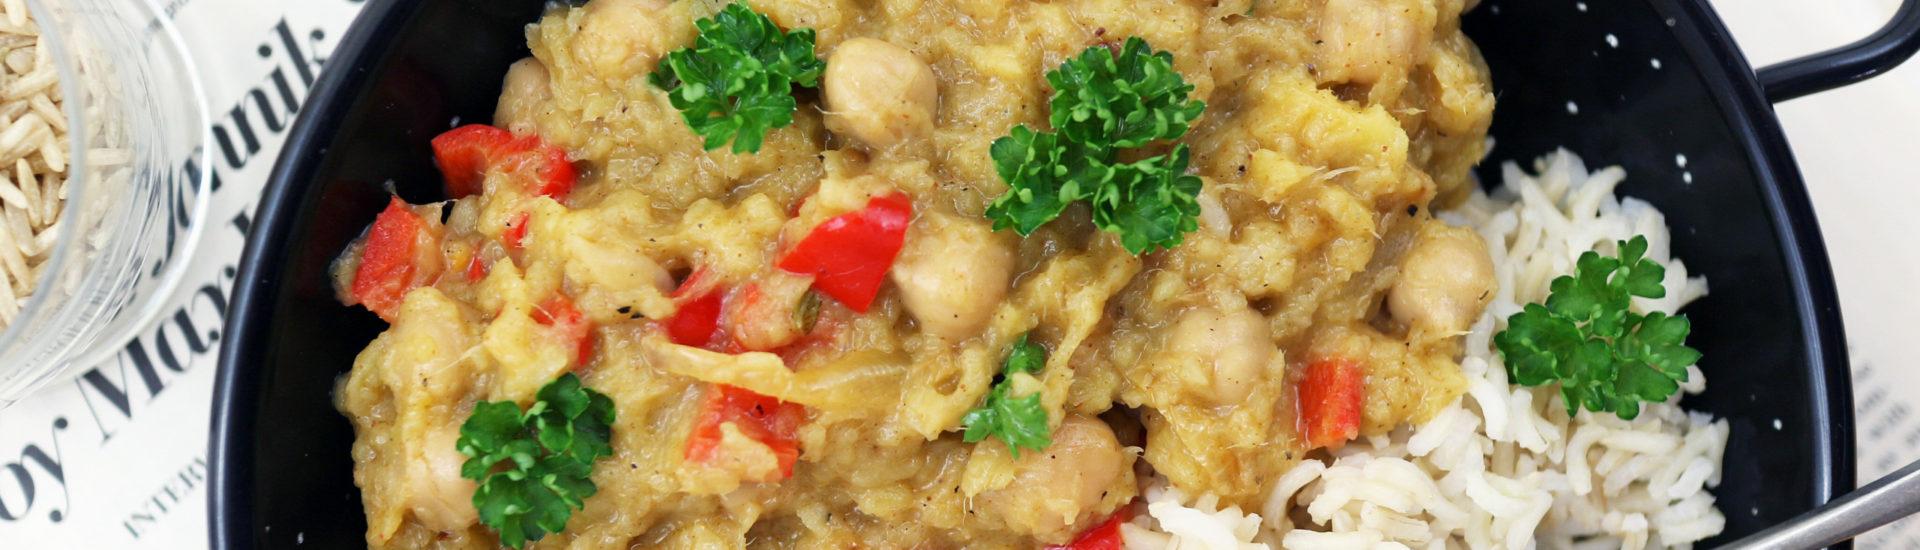 Curry vegan mango e ceci